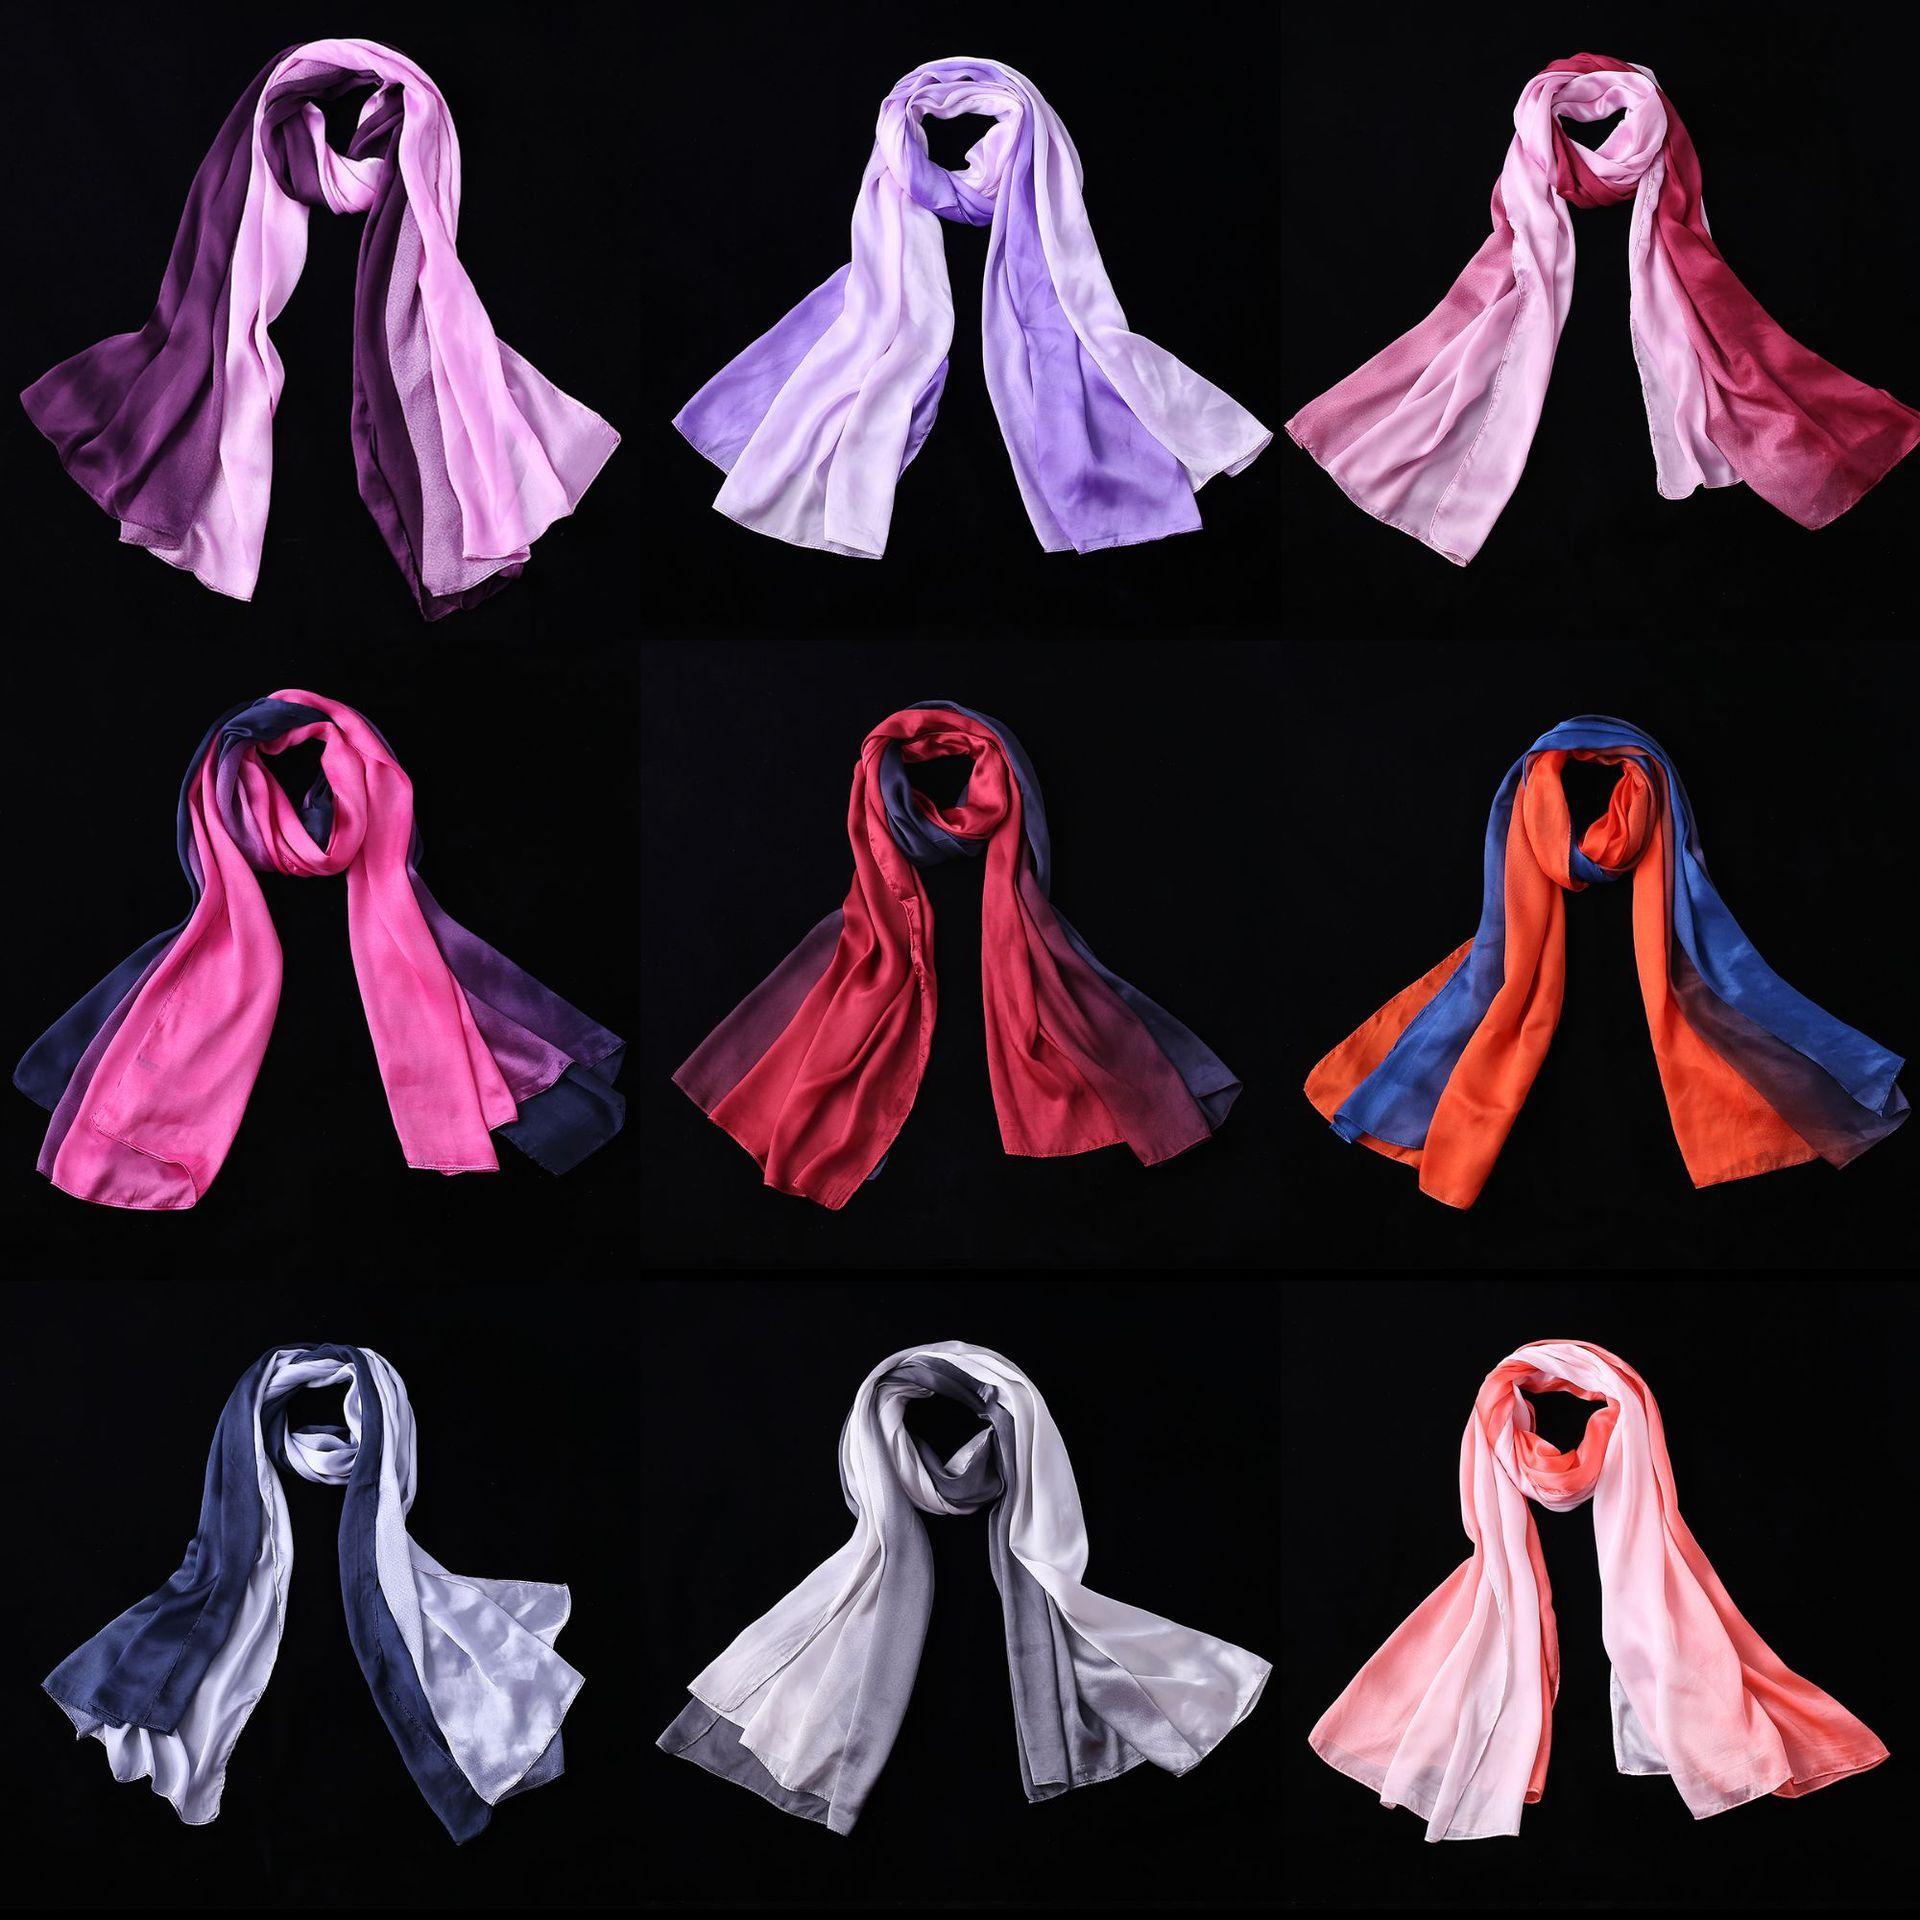 180cm Artificial Silk Gra nt Designer Scarf Women Hijab Shawls Pashmina Wrap Scarf Table Blanket Beach Towel Head Scarf Infinity Scarves From Ficoco